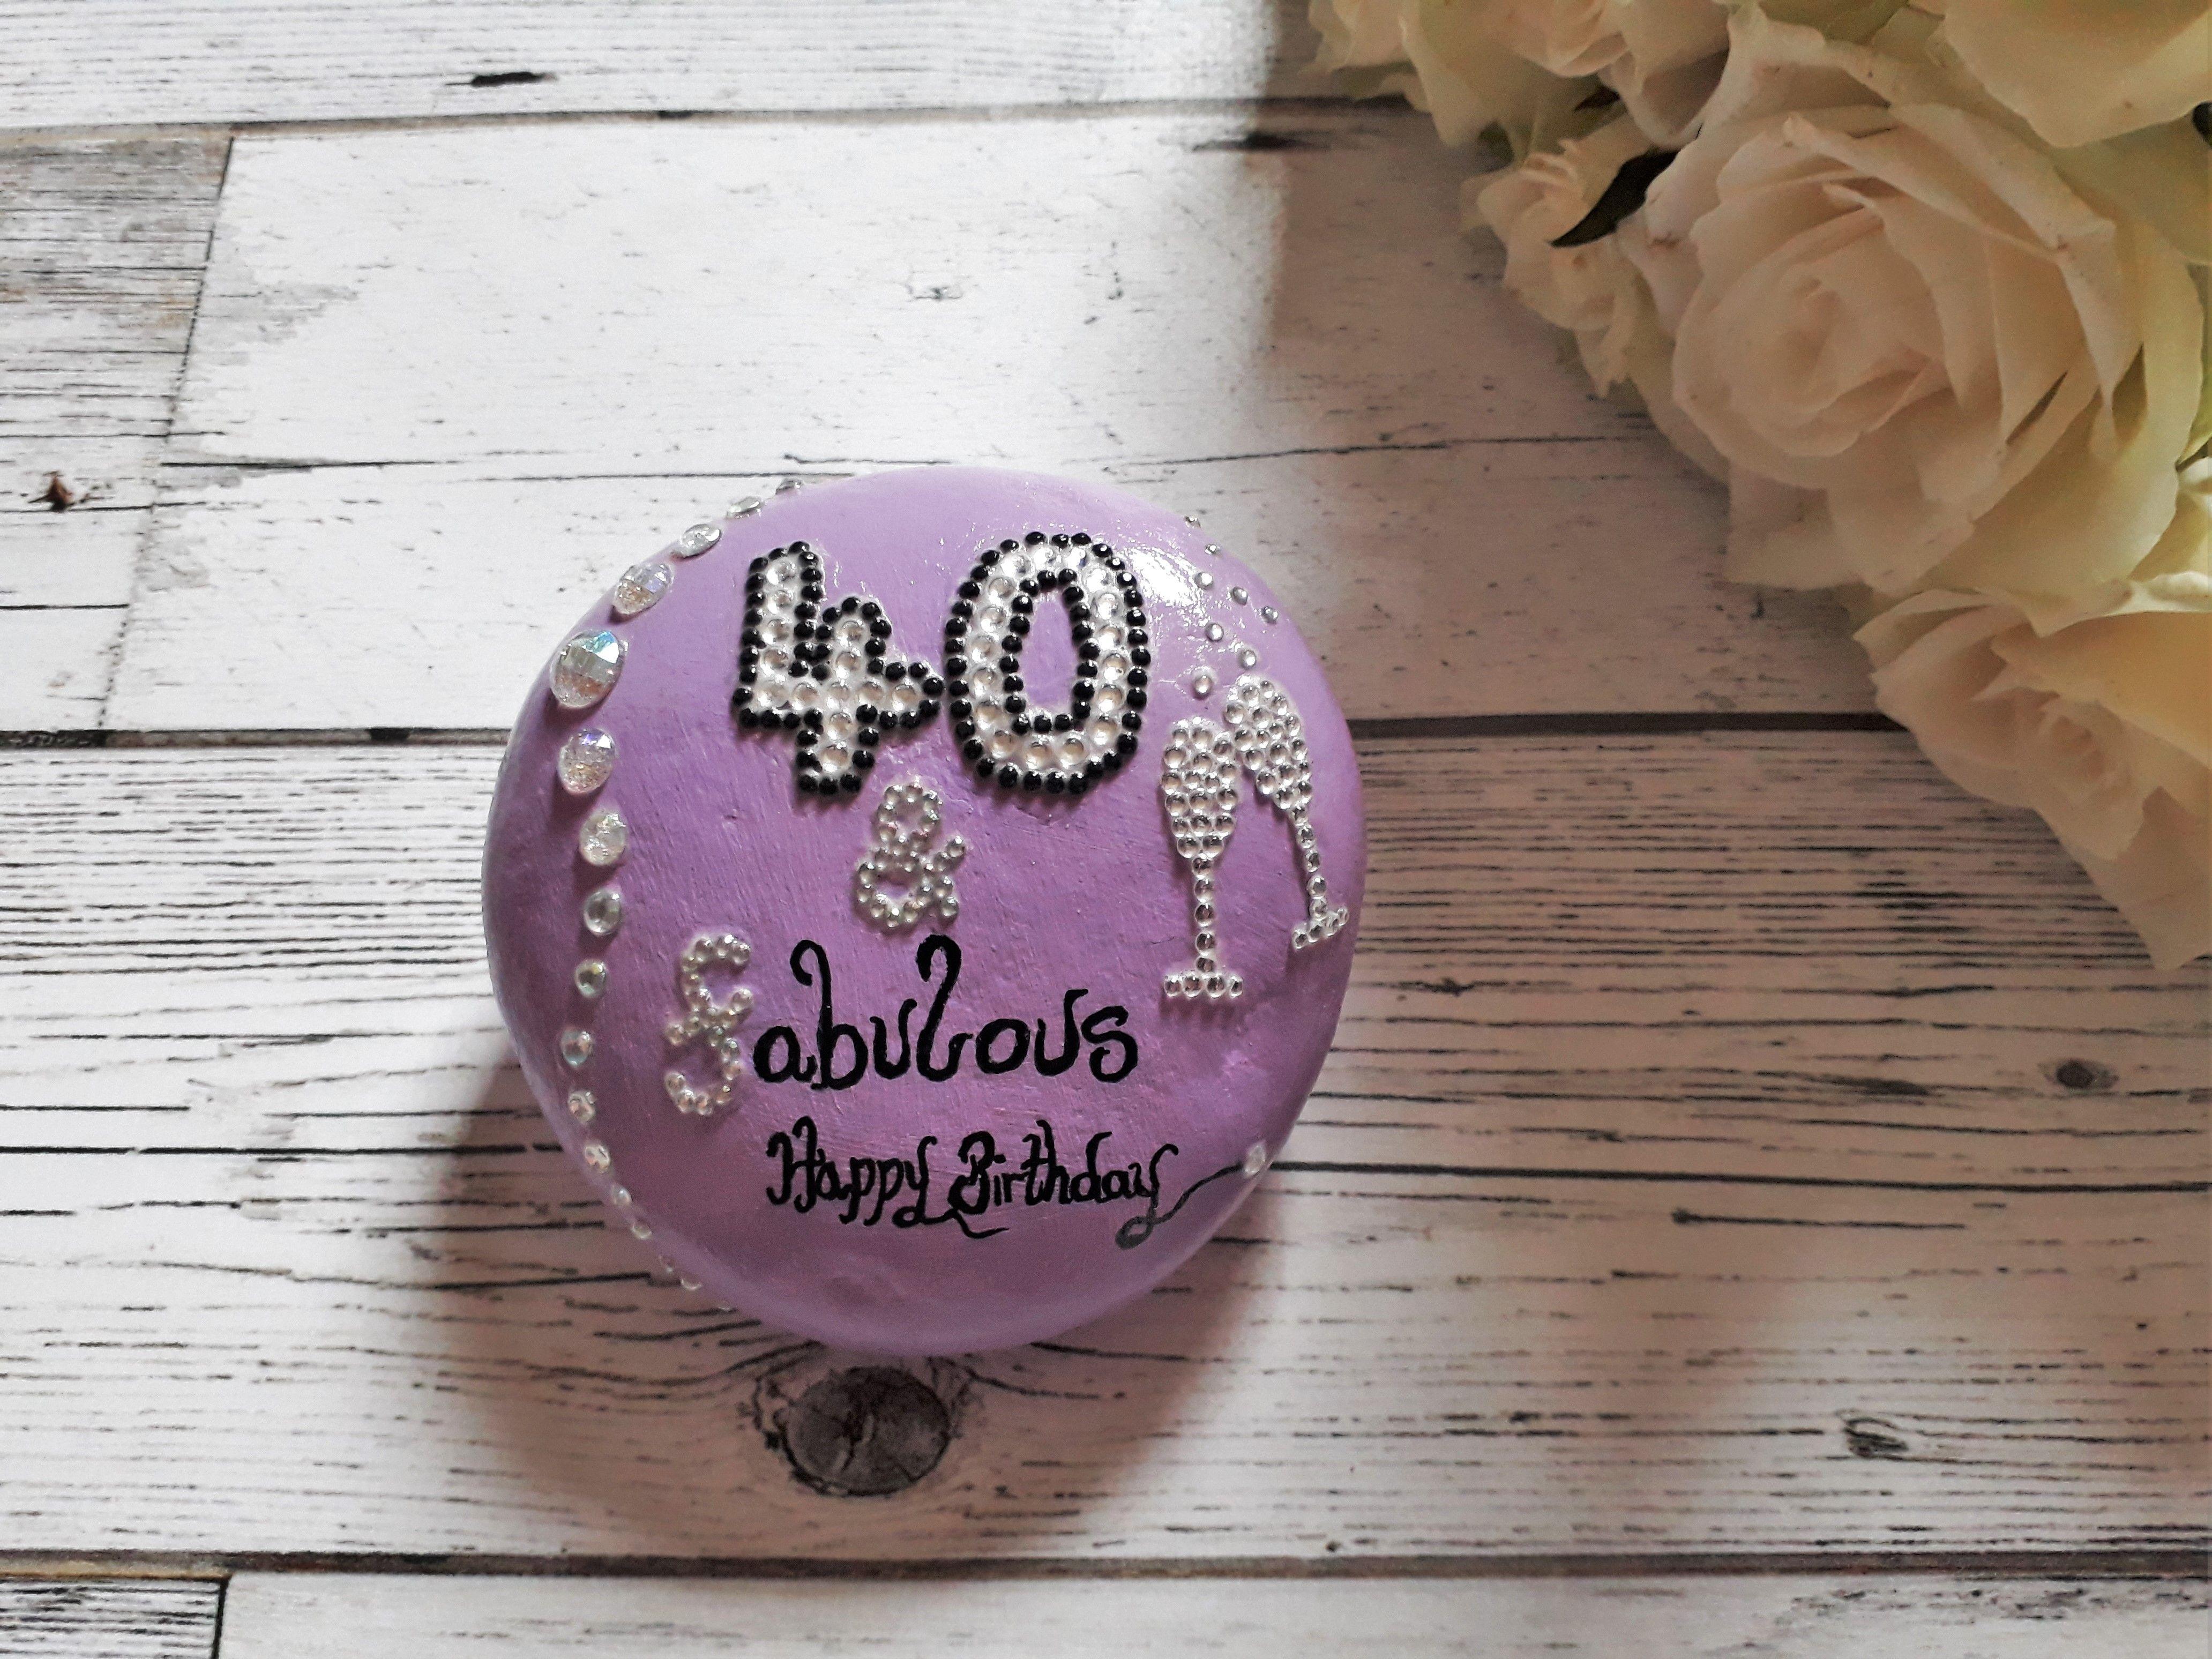 50 fabulous birthday pebble 50 birthday gift for her